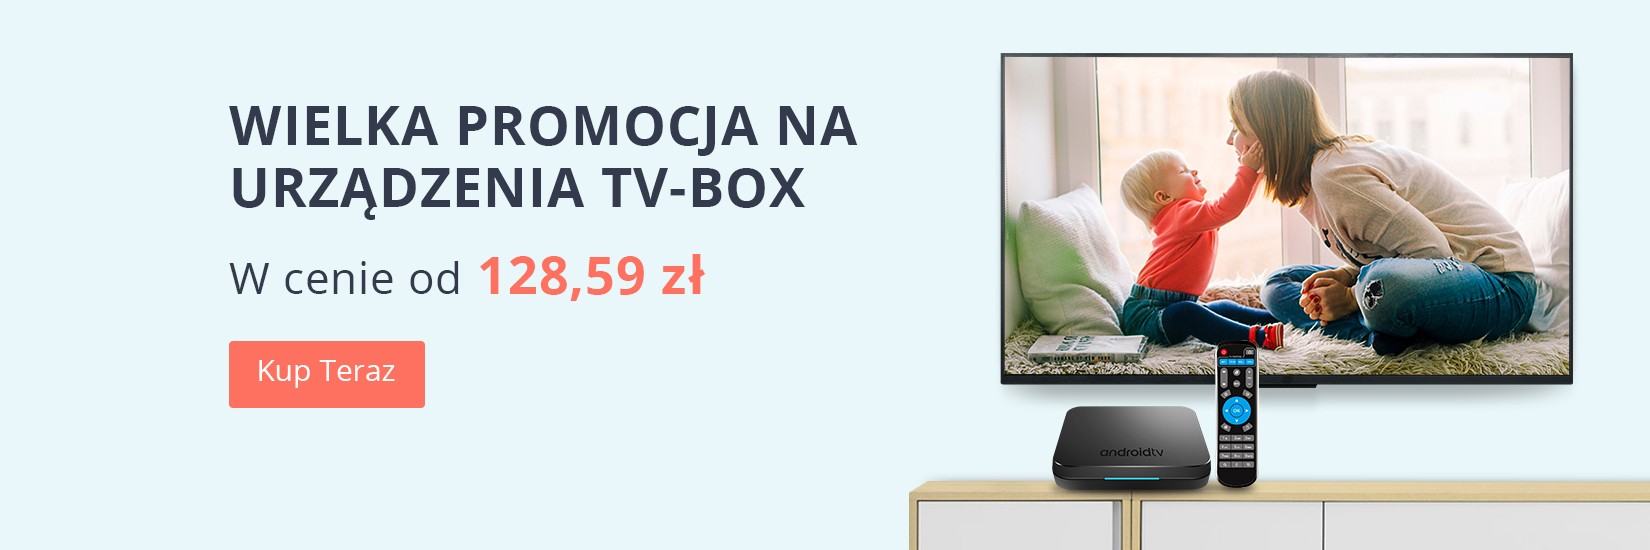 TV Box Promotion